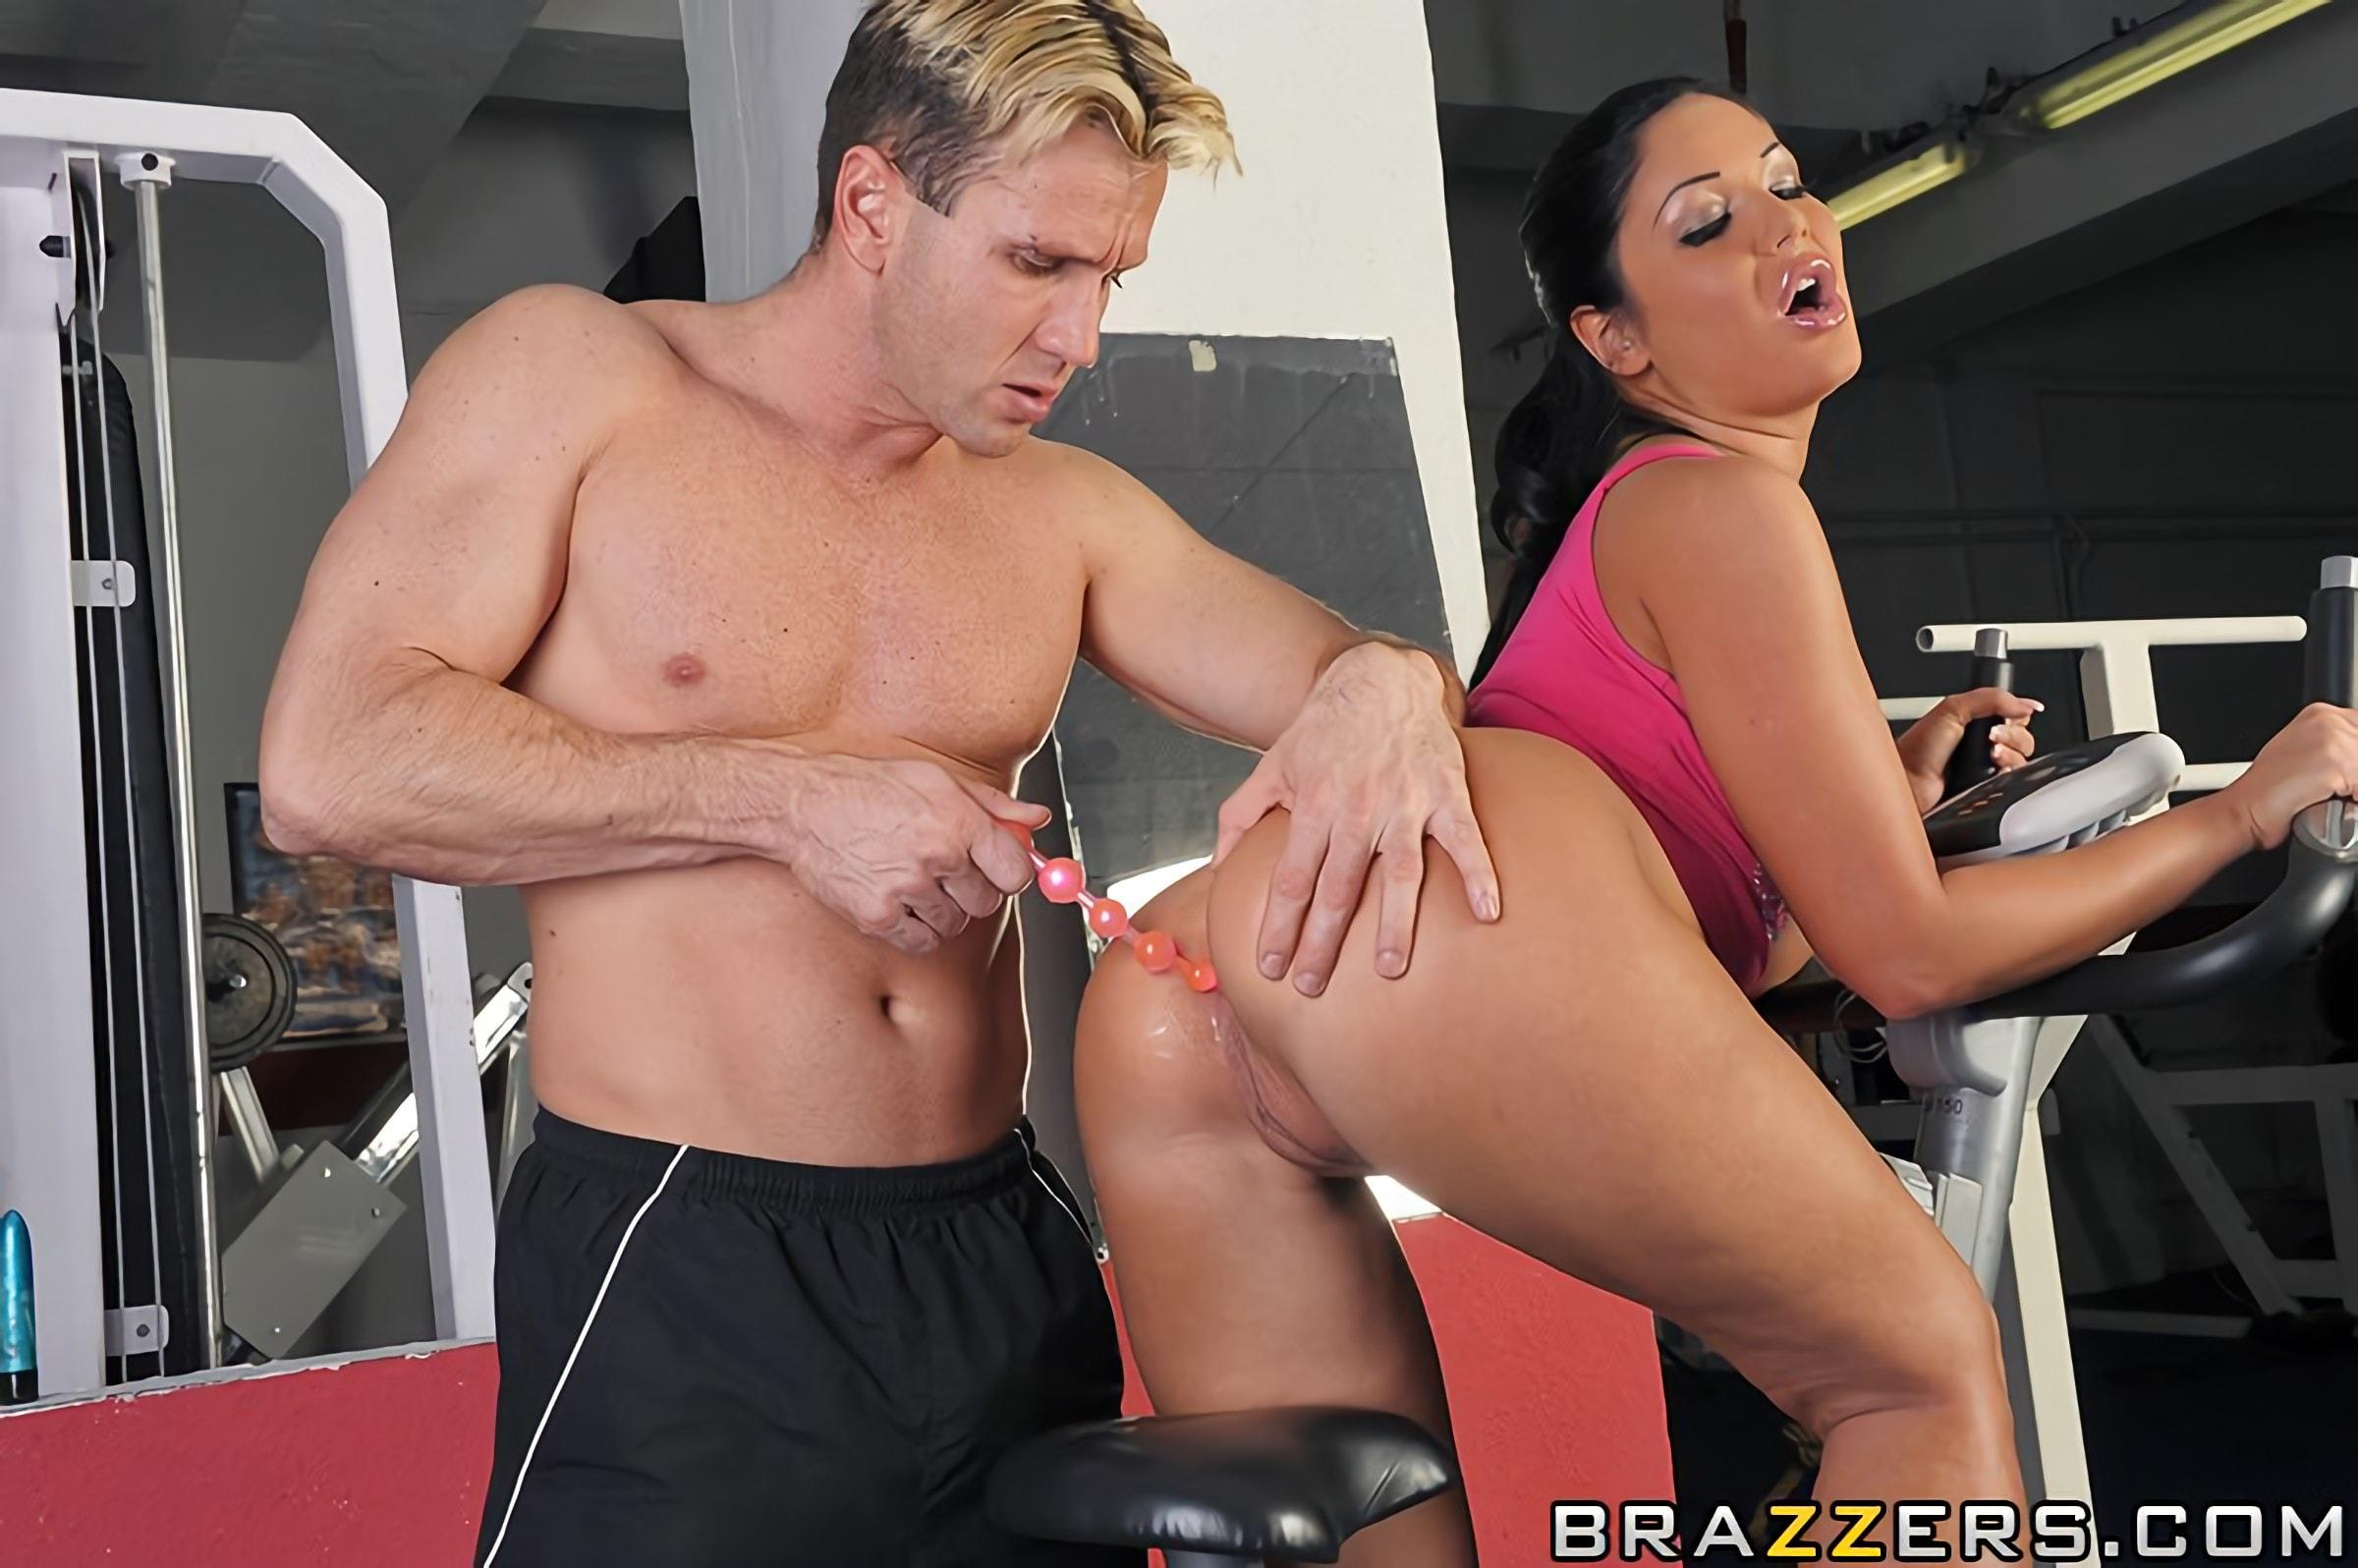 Тебе замутила с тренером секс дилдо